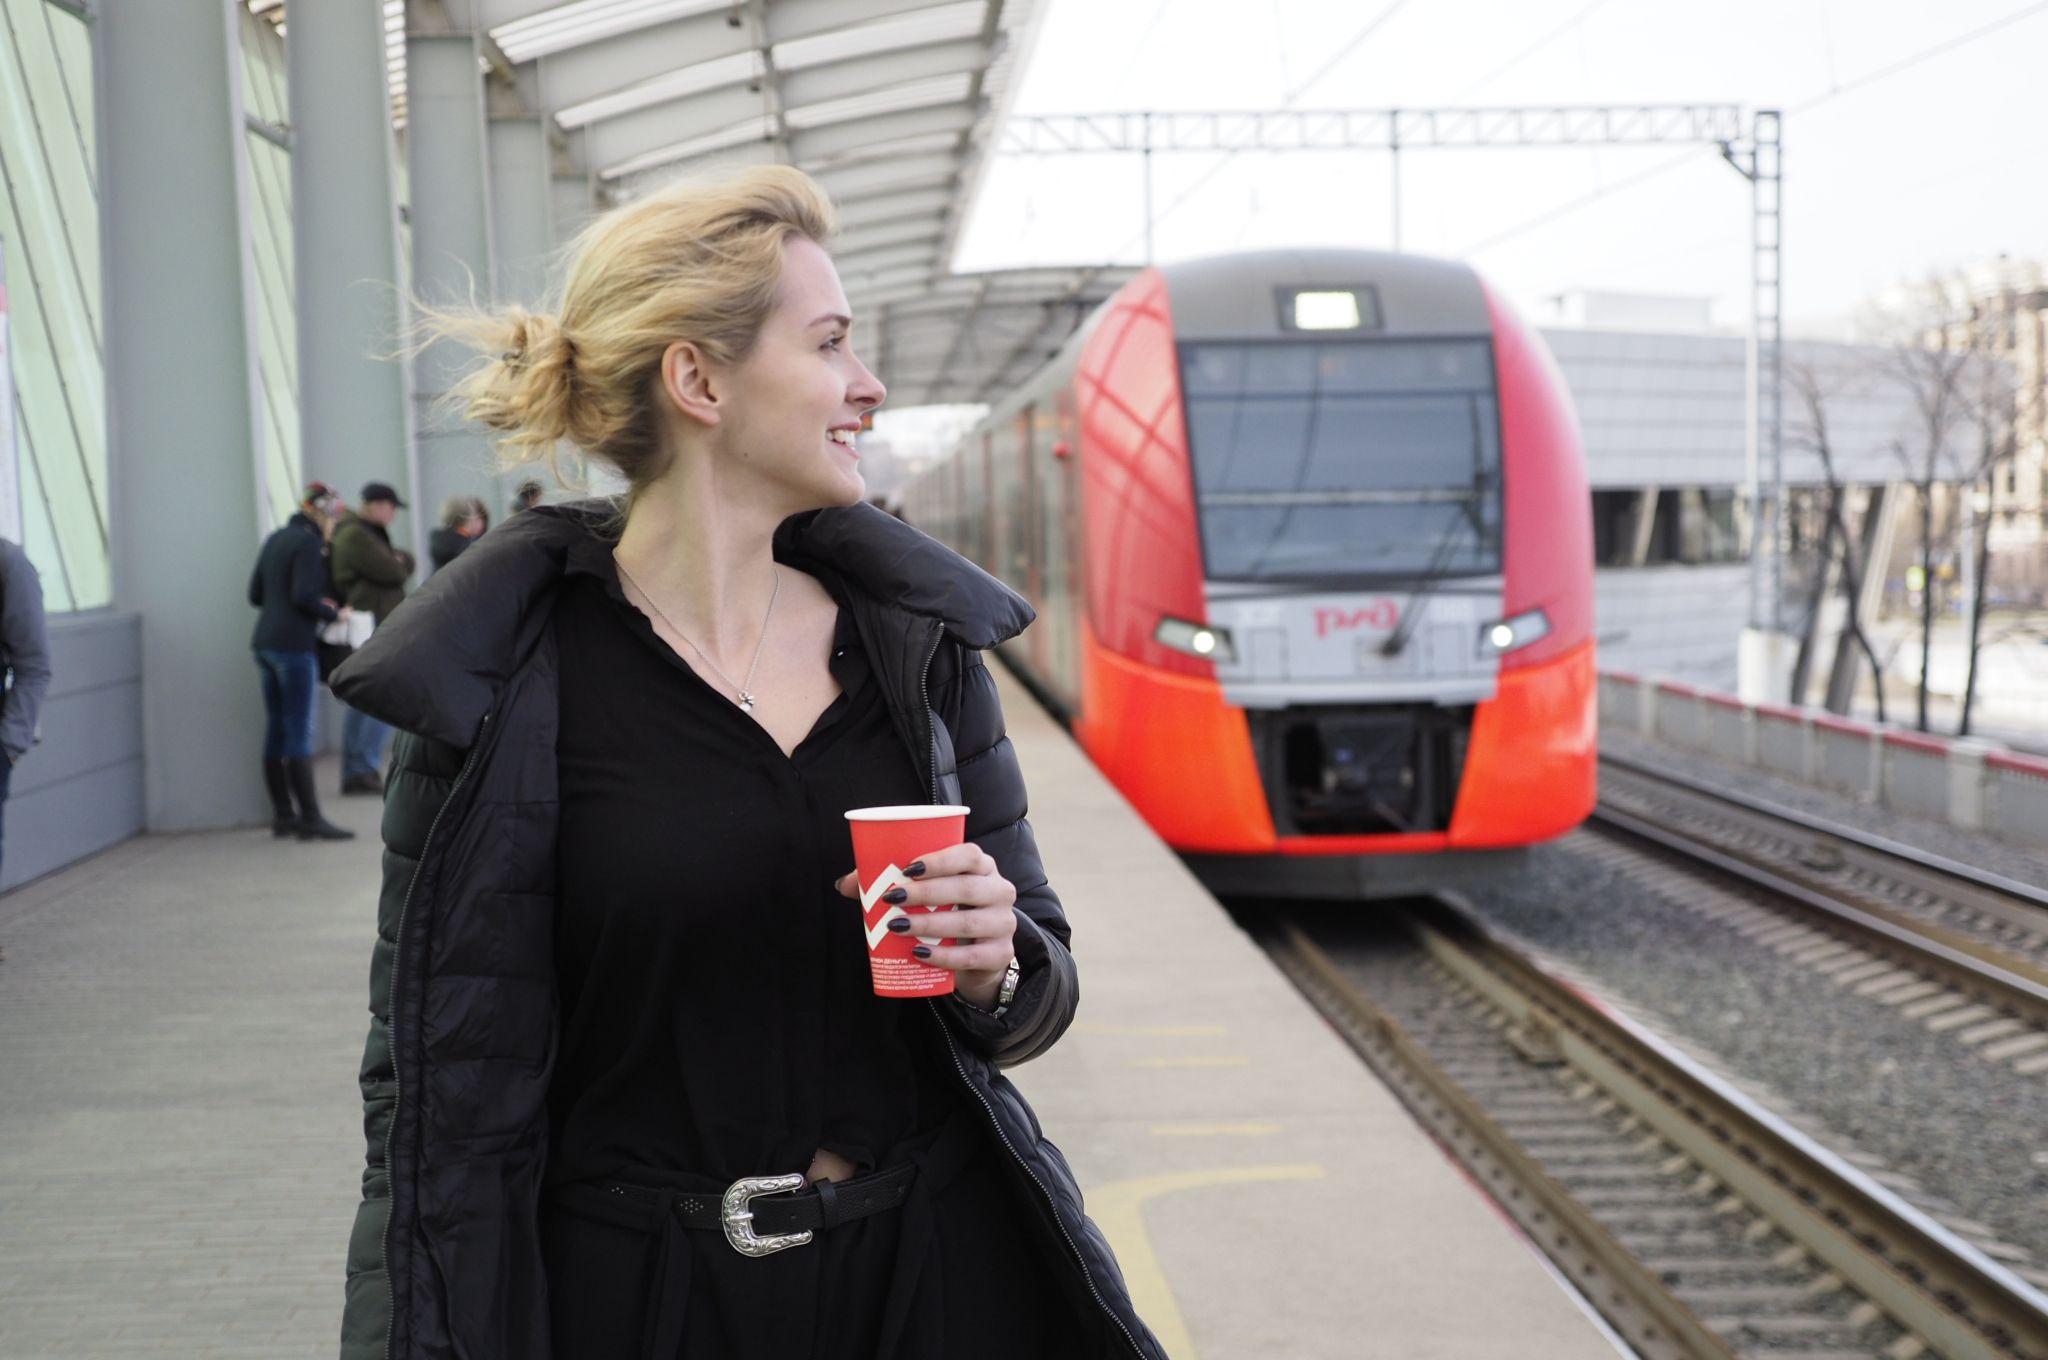 Пассажиропоток МЦК вырос на 12,7 процента. Фото: Антон Гердо